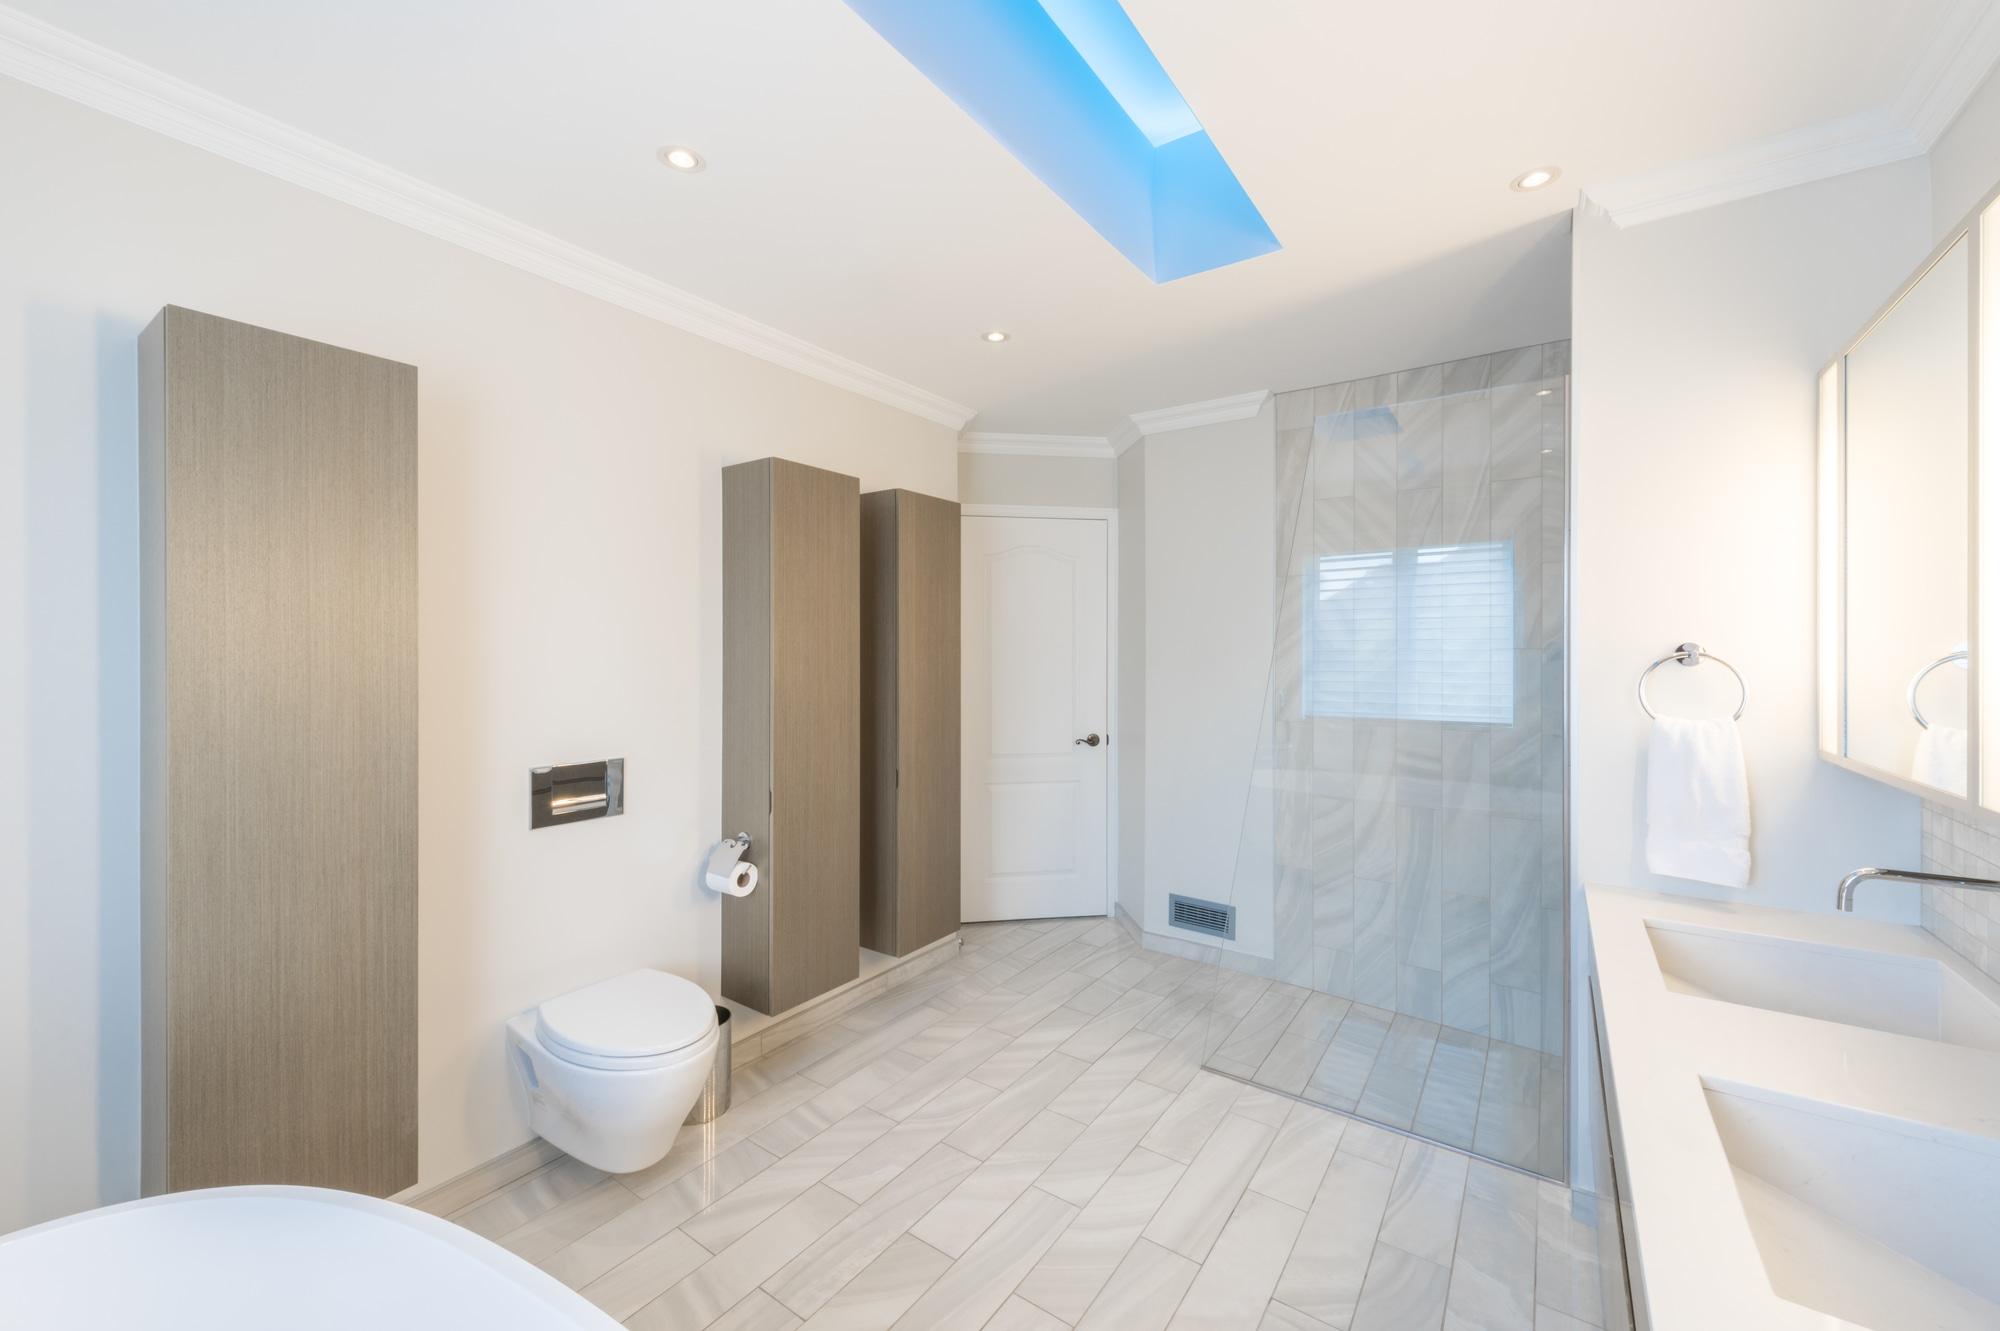 salle de bain moderne avec douche vitrée en céramique